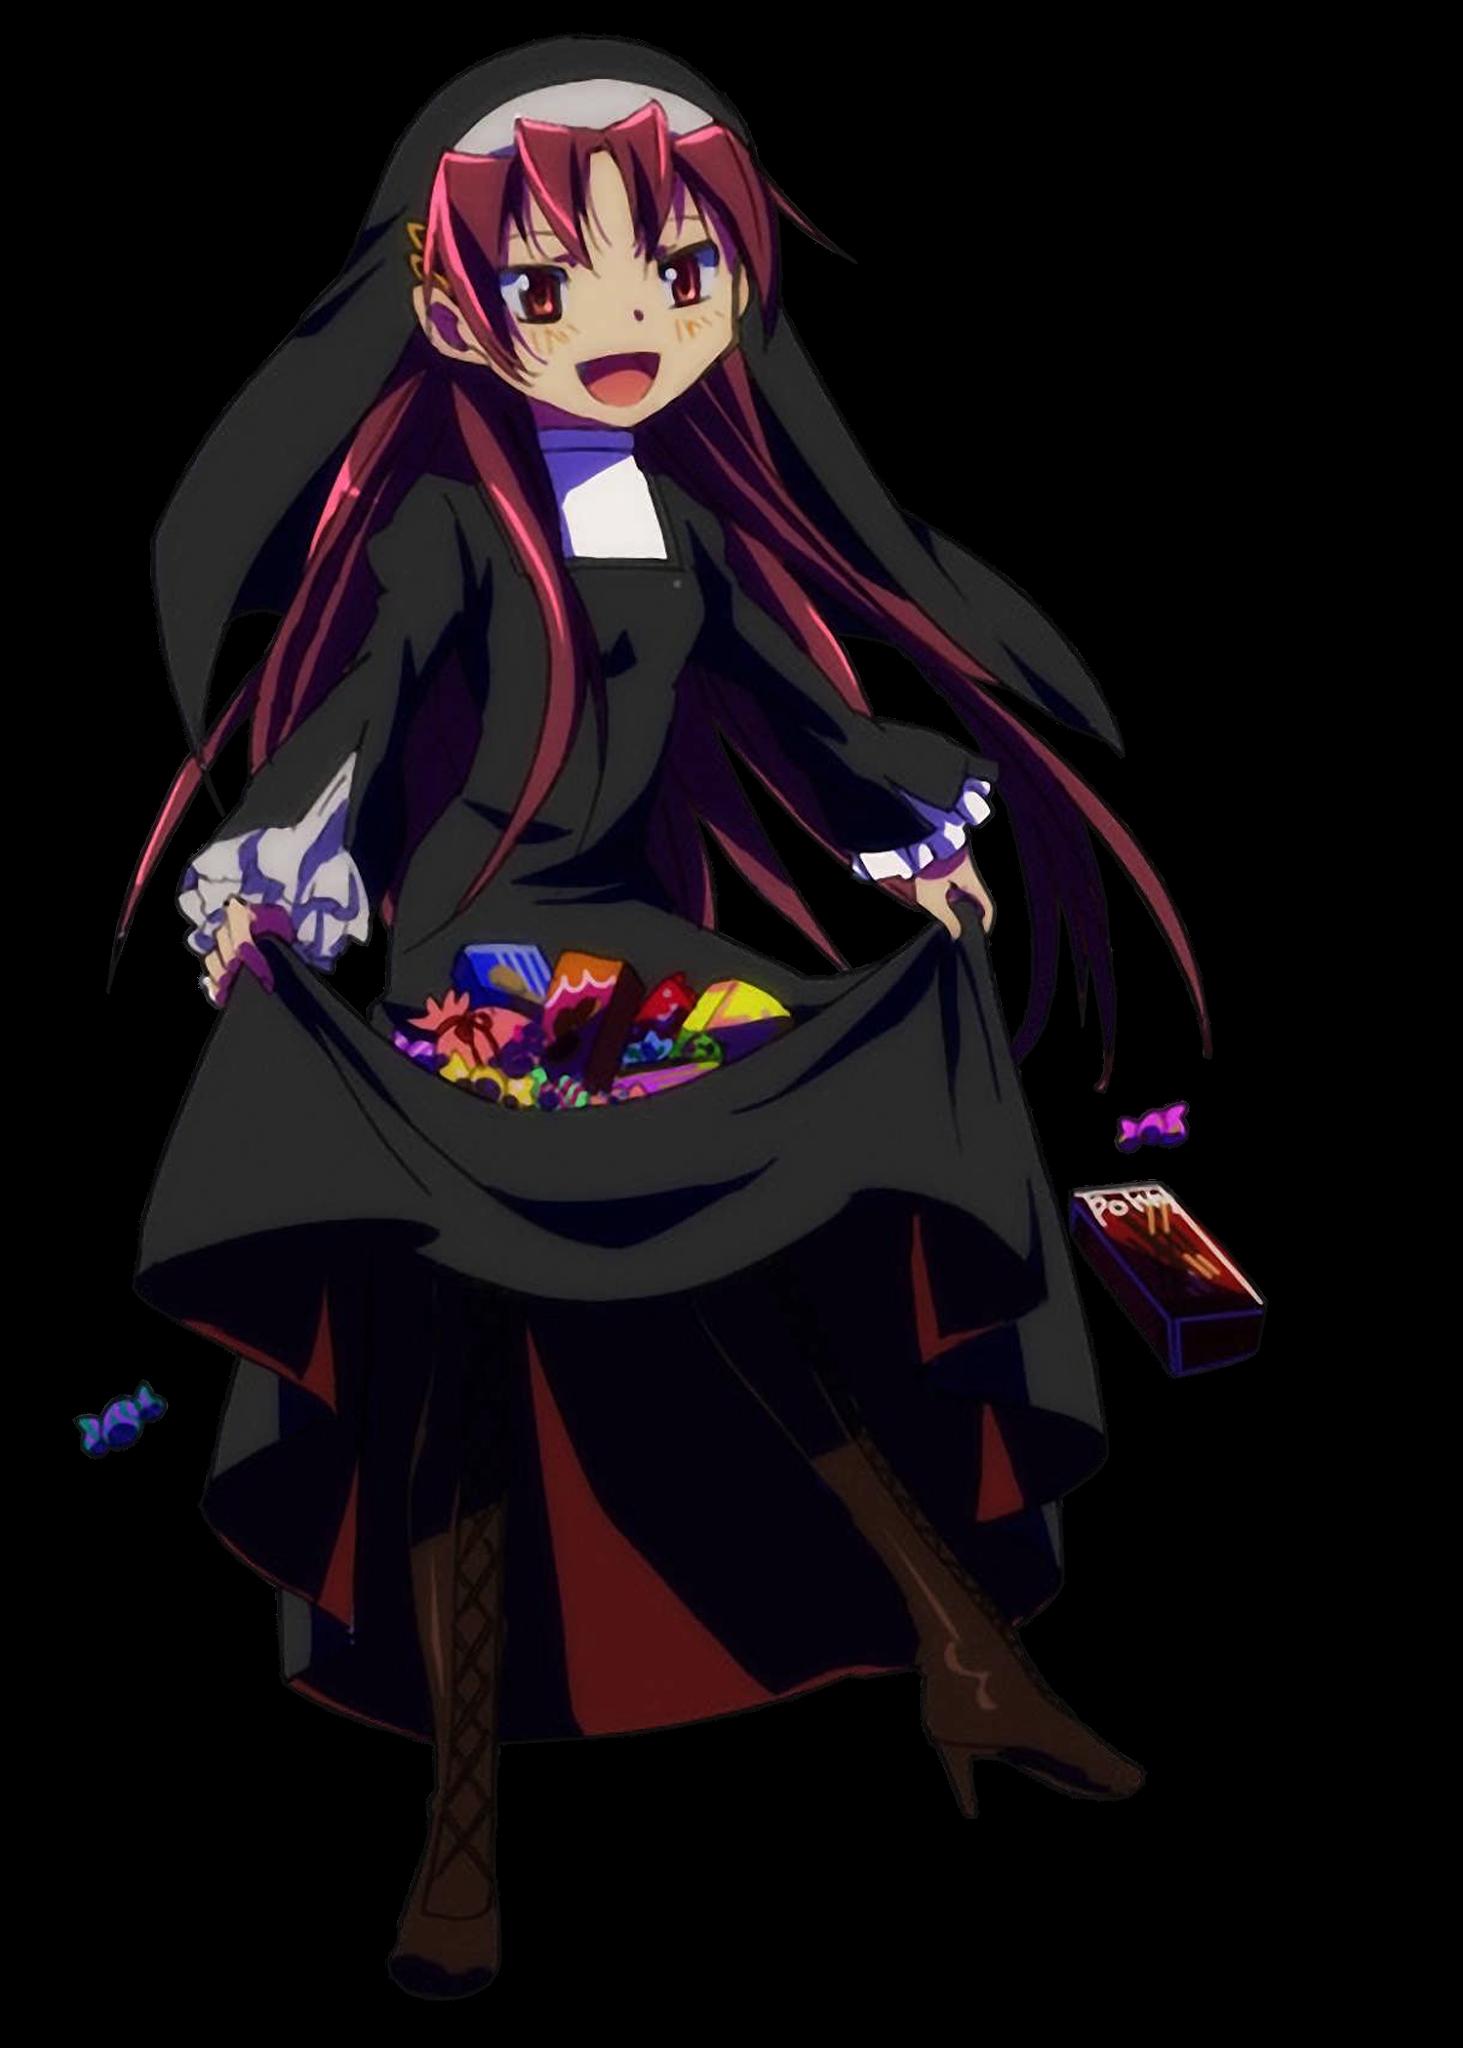 Madoka Magica - Sakura Kyouko Halloween